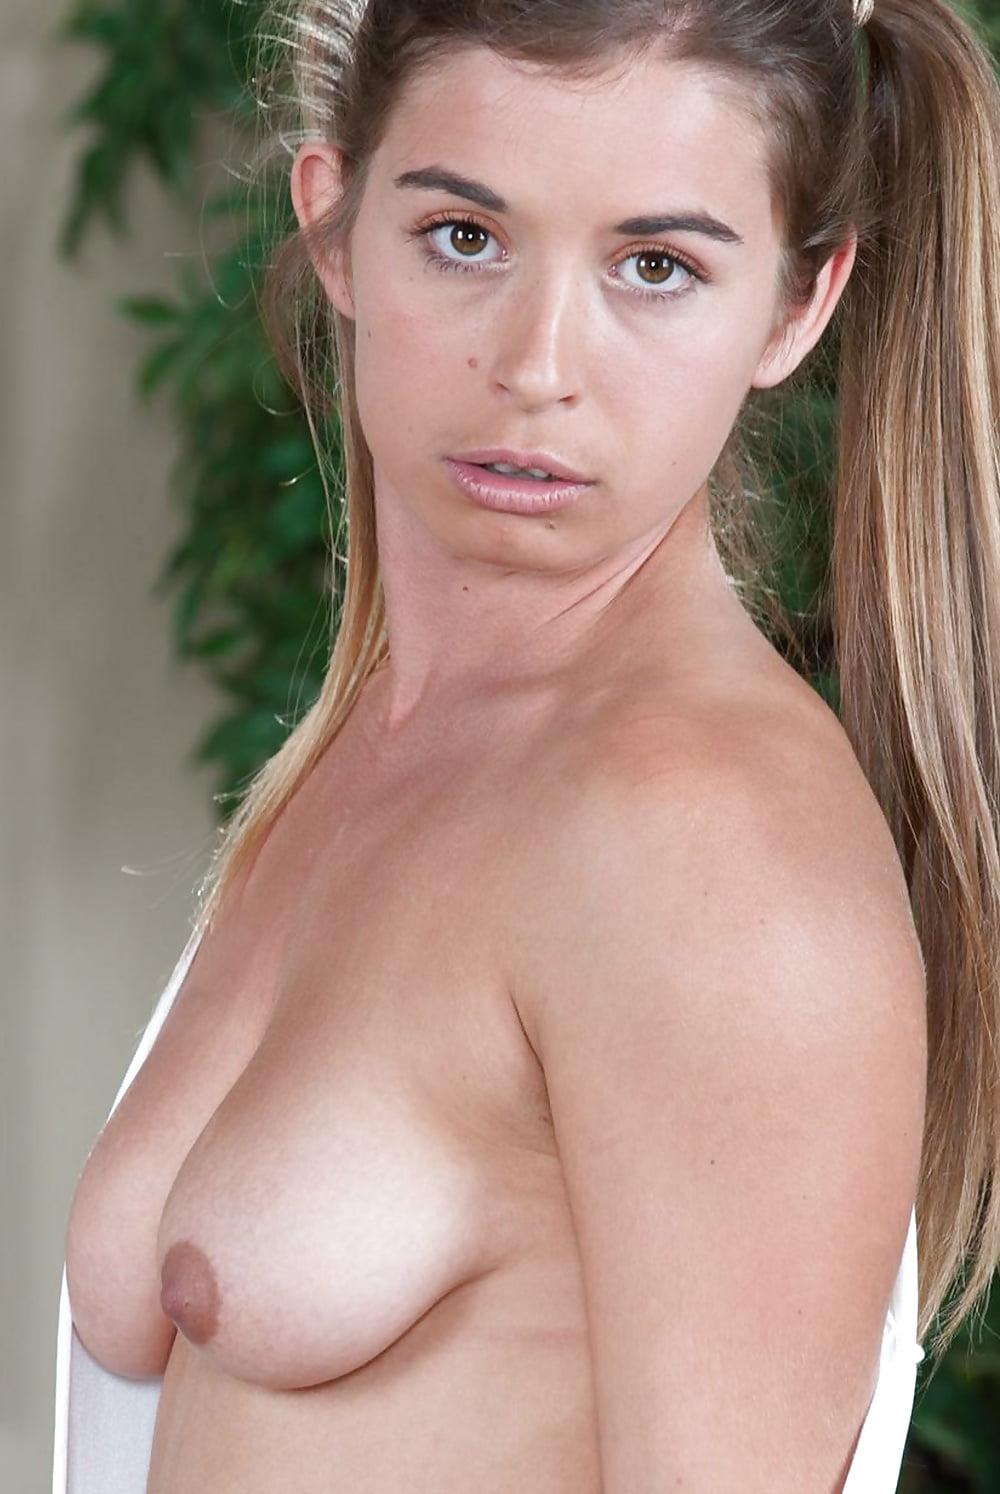 tina-majorino-nude-jennifer-anniston-fake-nudes